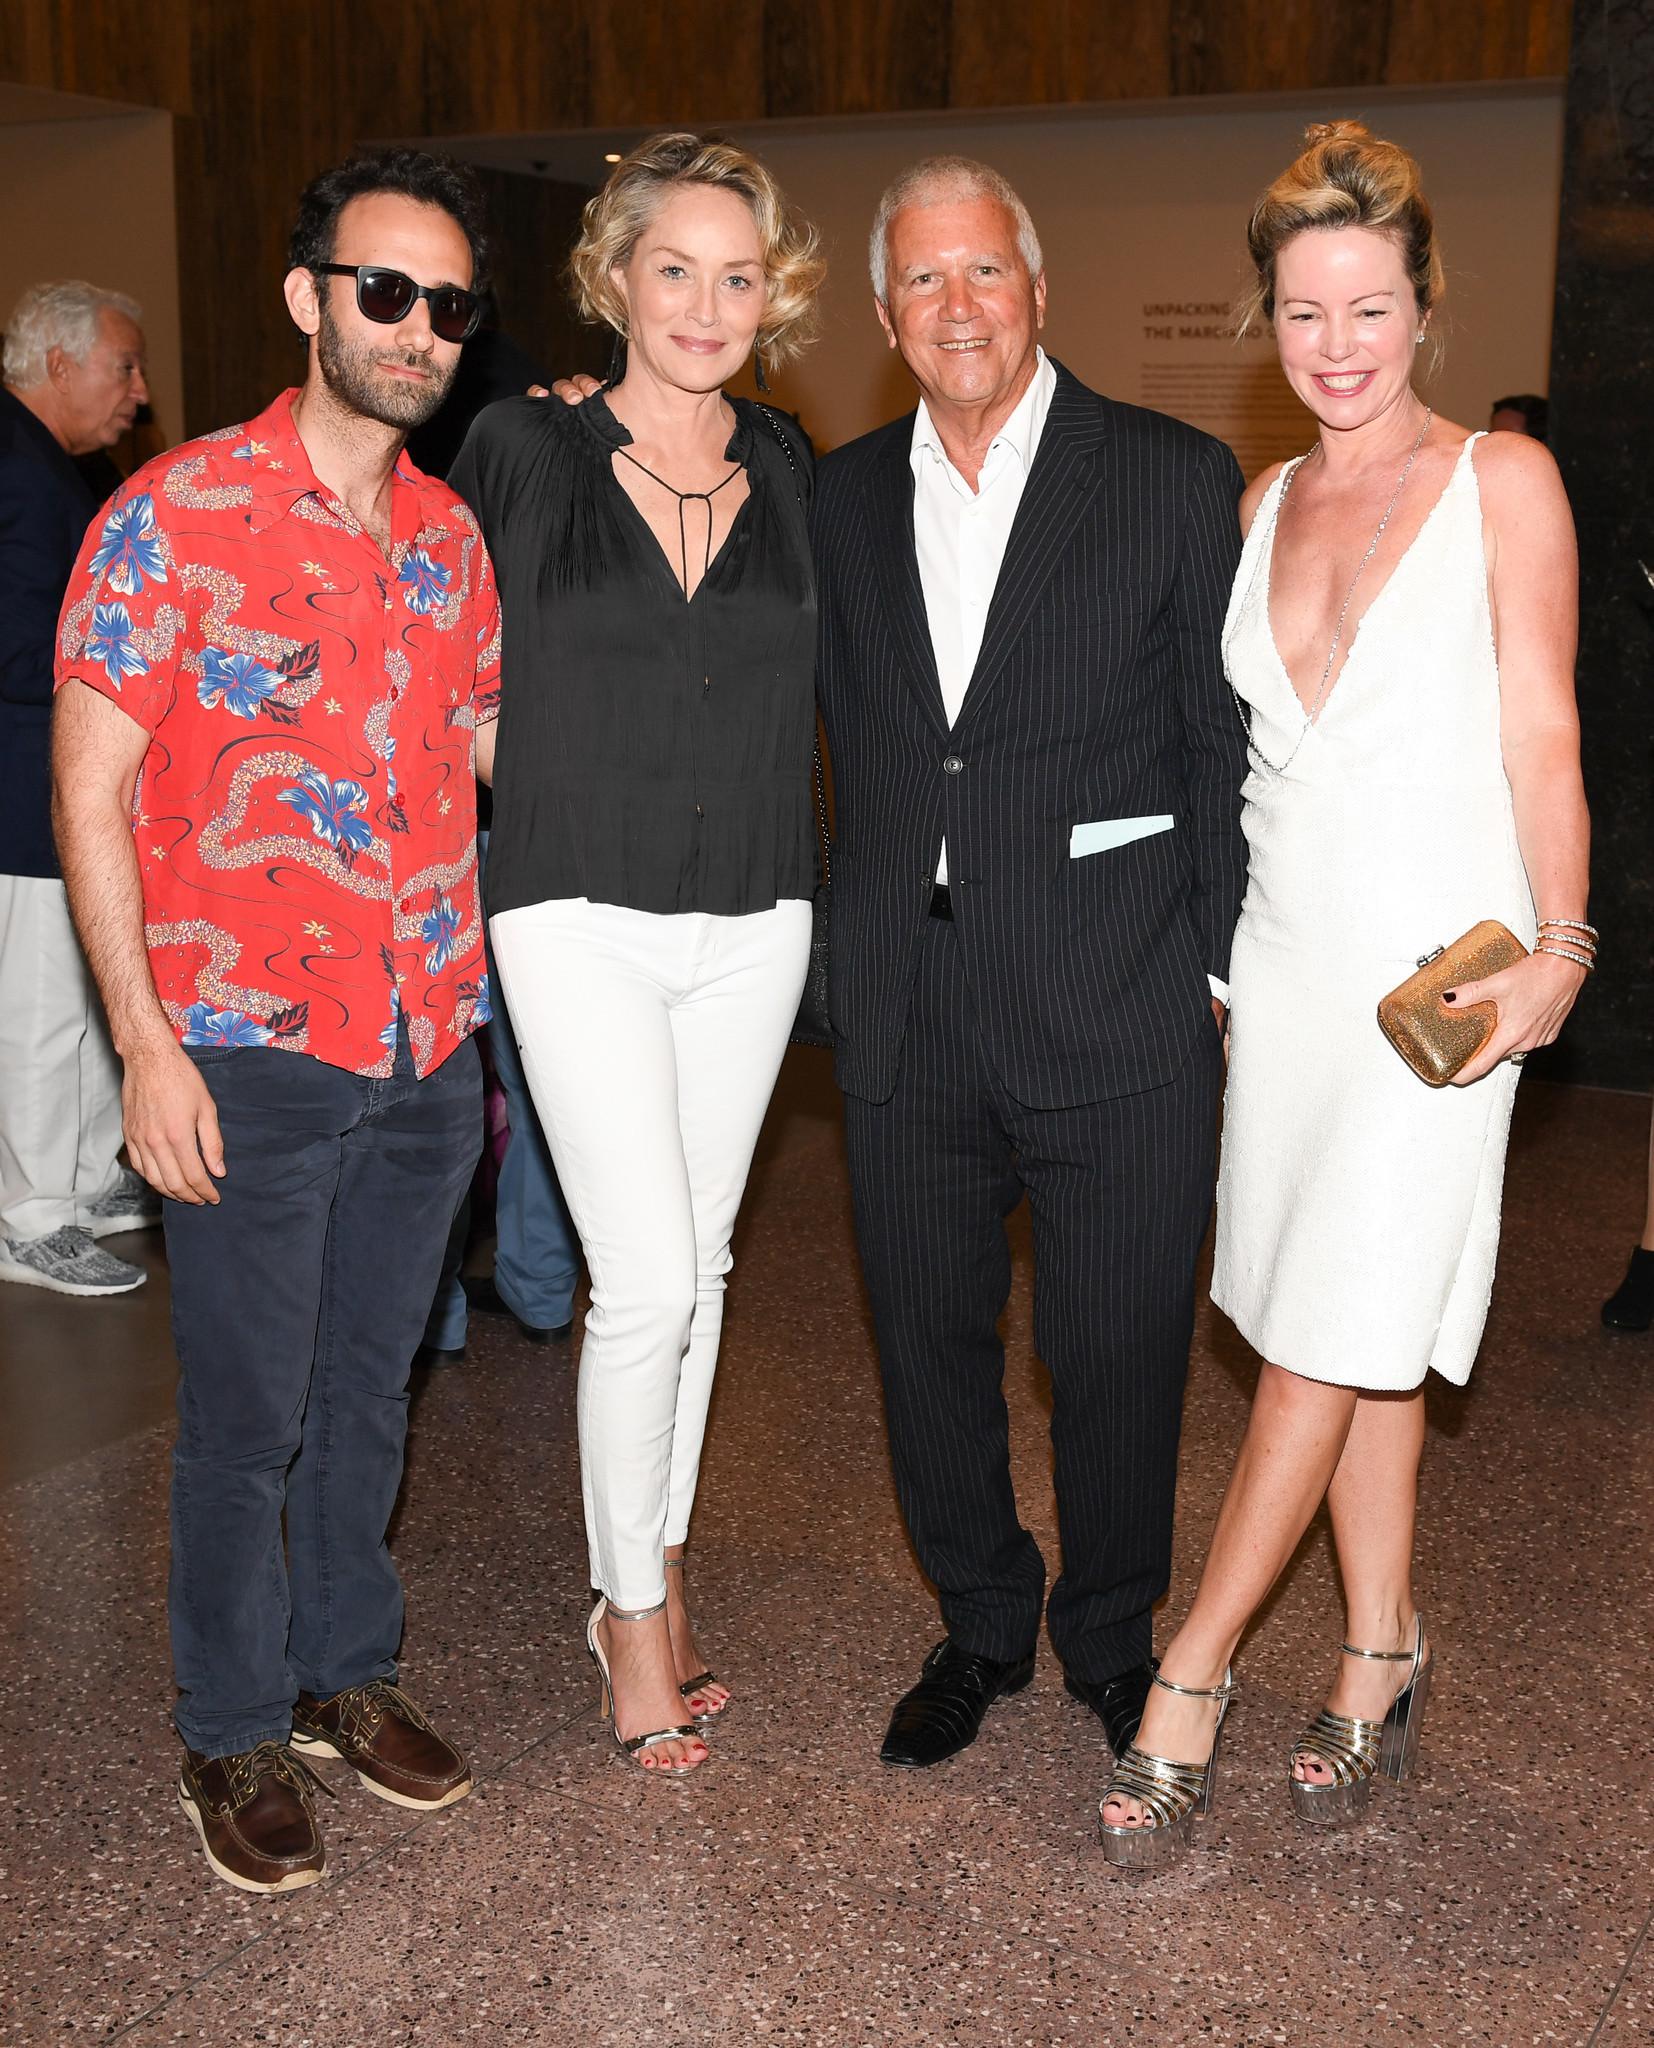 Artist Alex Israel, Sharon Stone and art dealers Larry Gagosian and Chrissie Erpf.